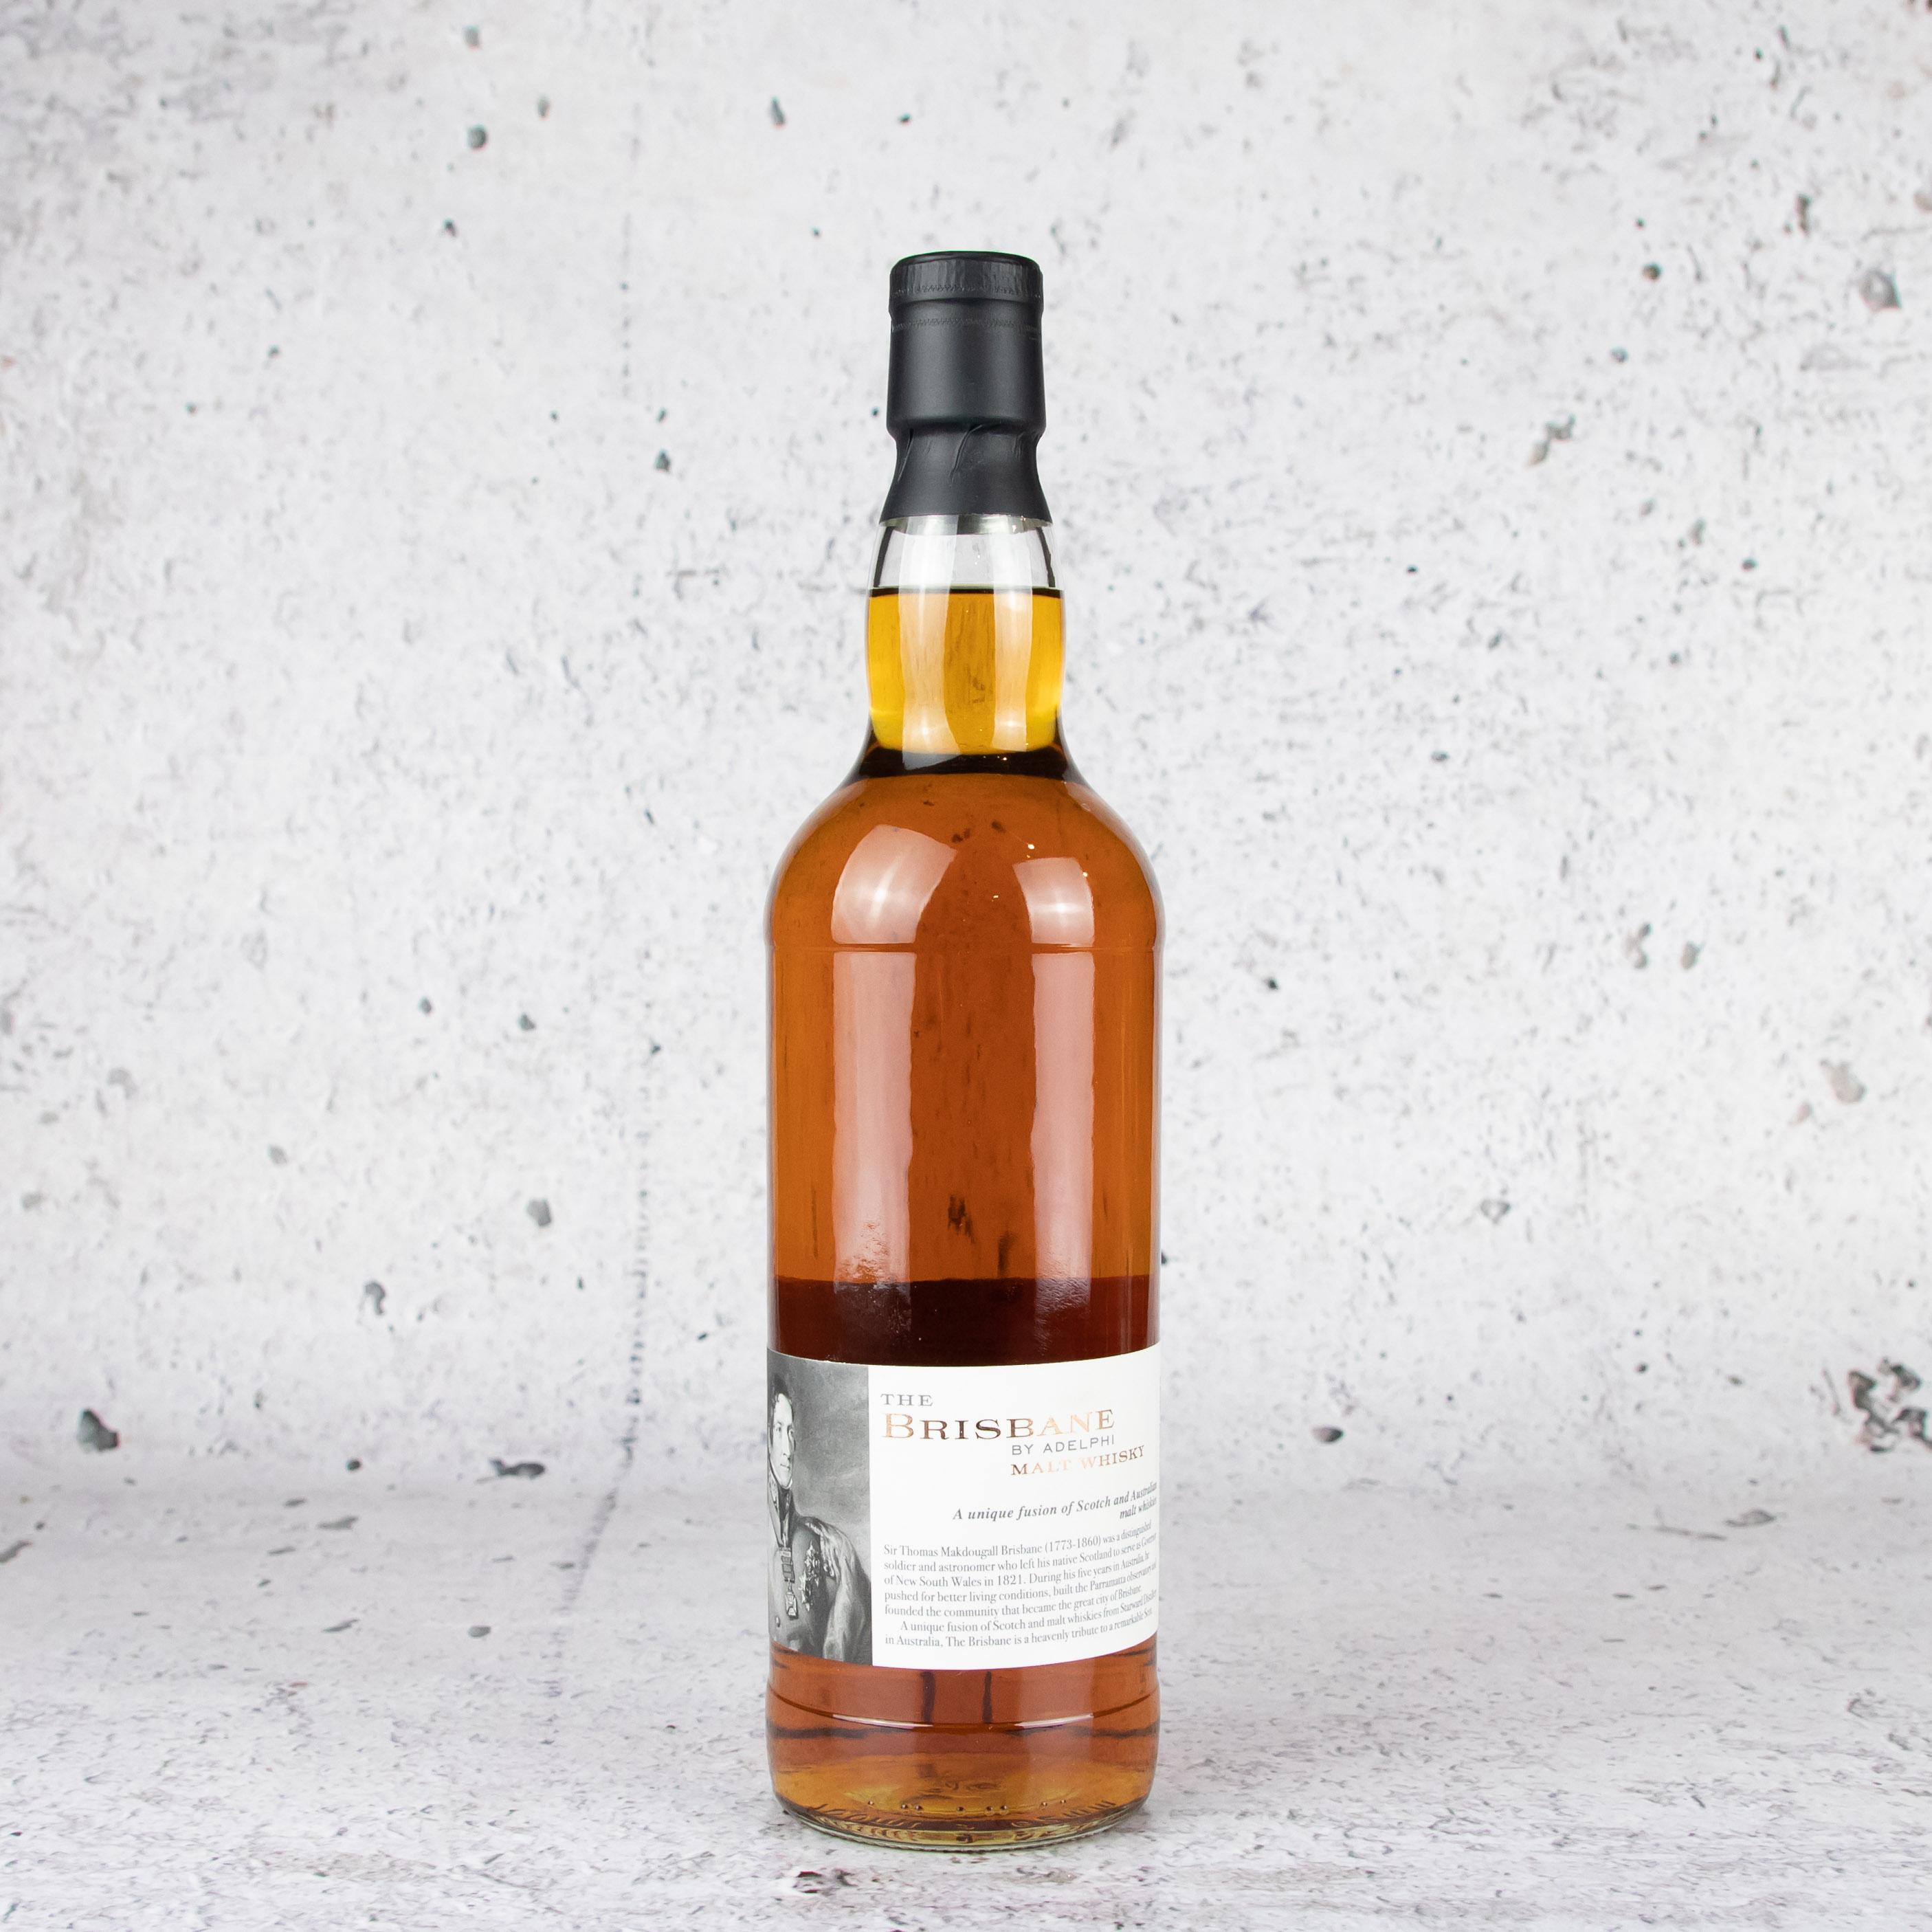 Adelphi The Brisbane 5 Y/O Fusion Malt Whisky